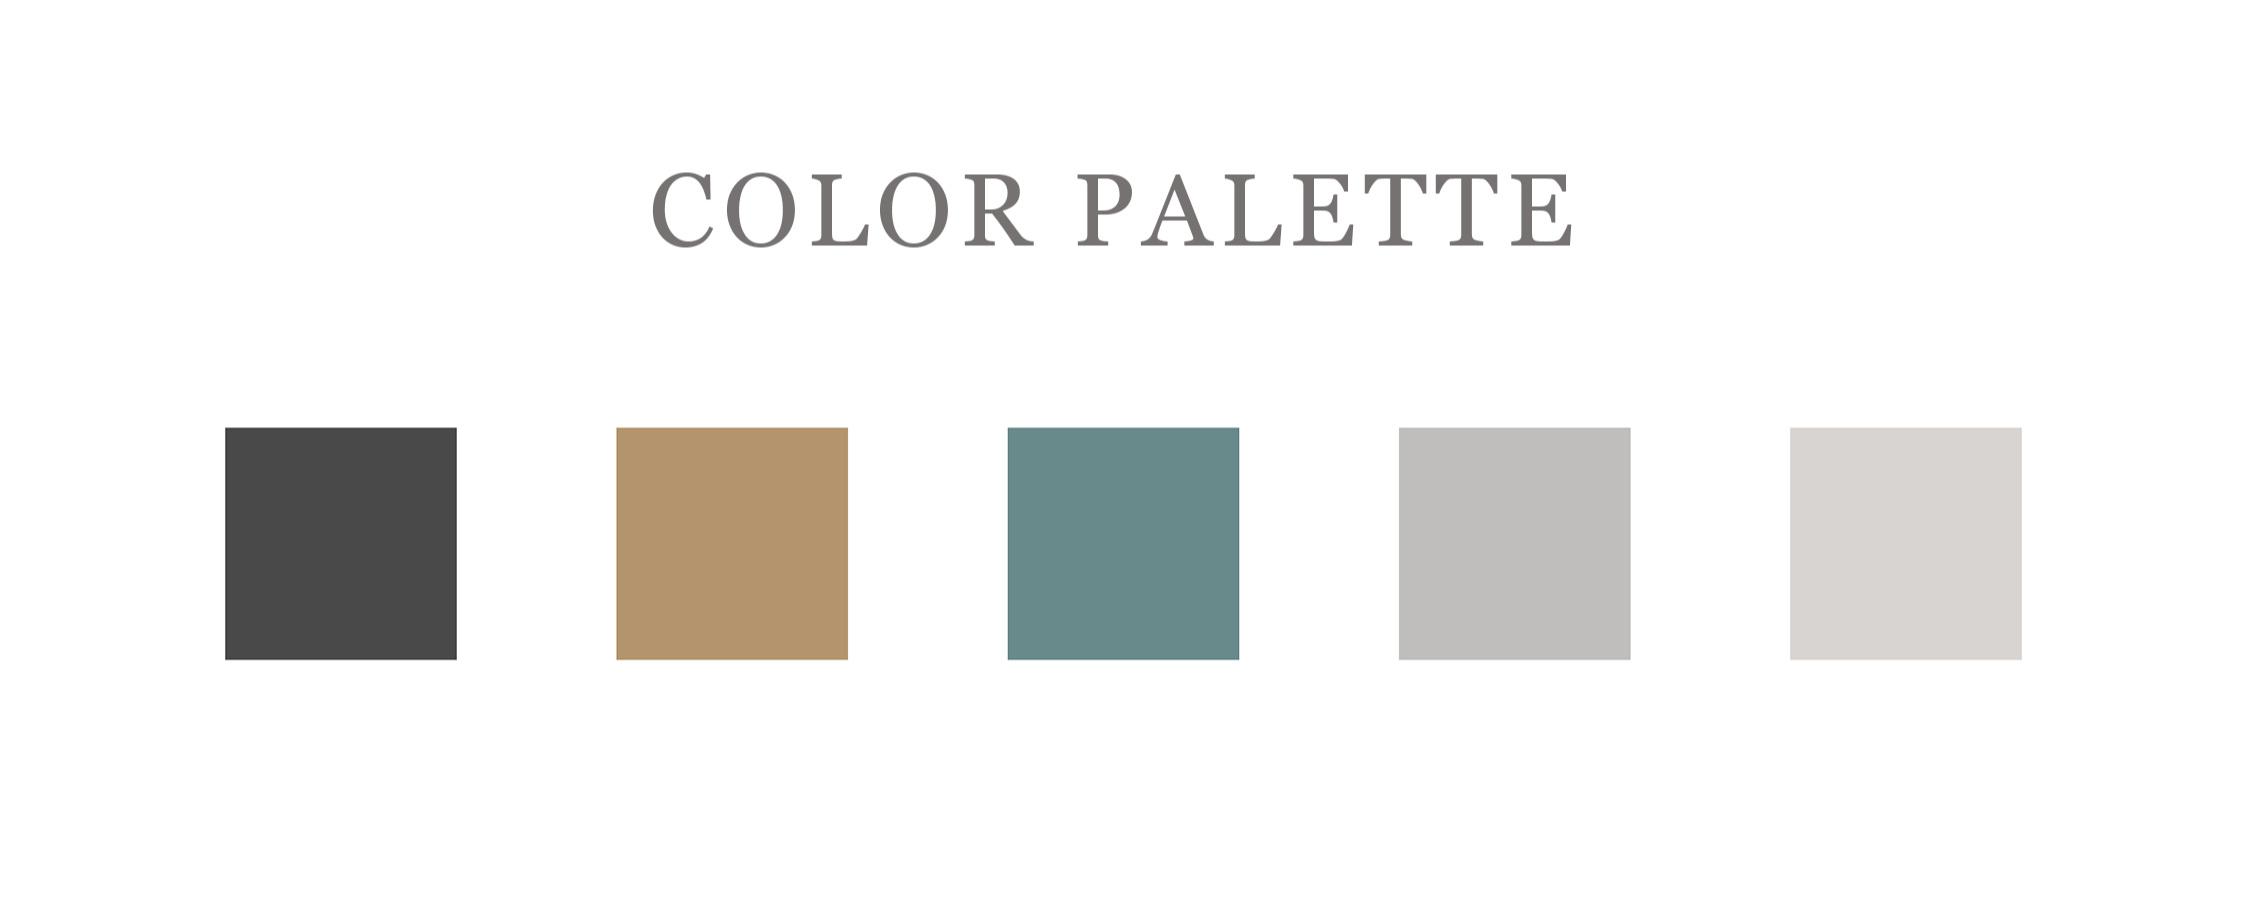 quiverfullofchildrencolorpalette